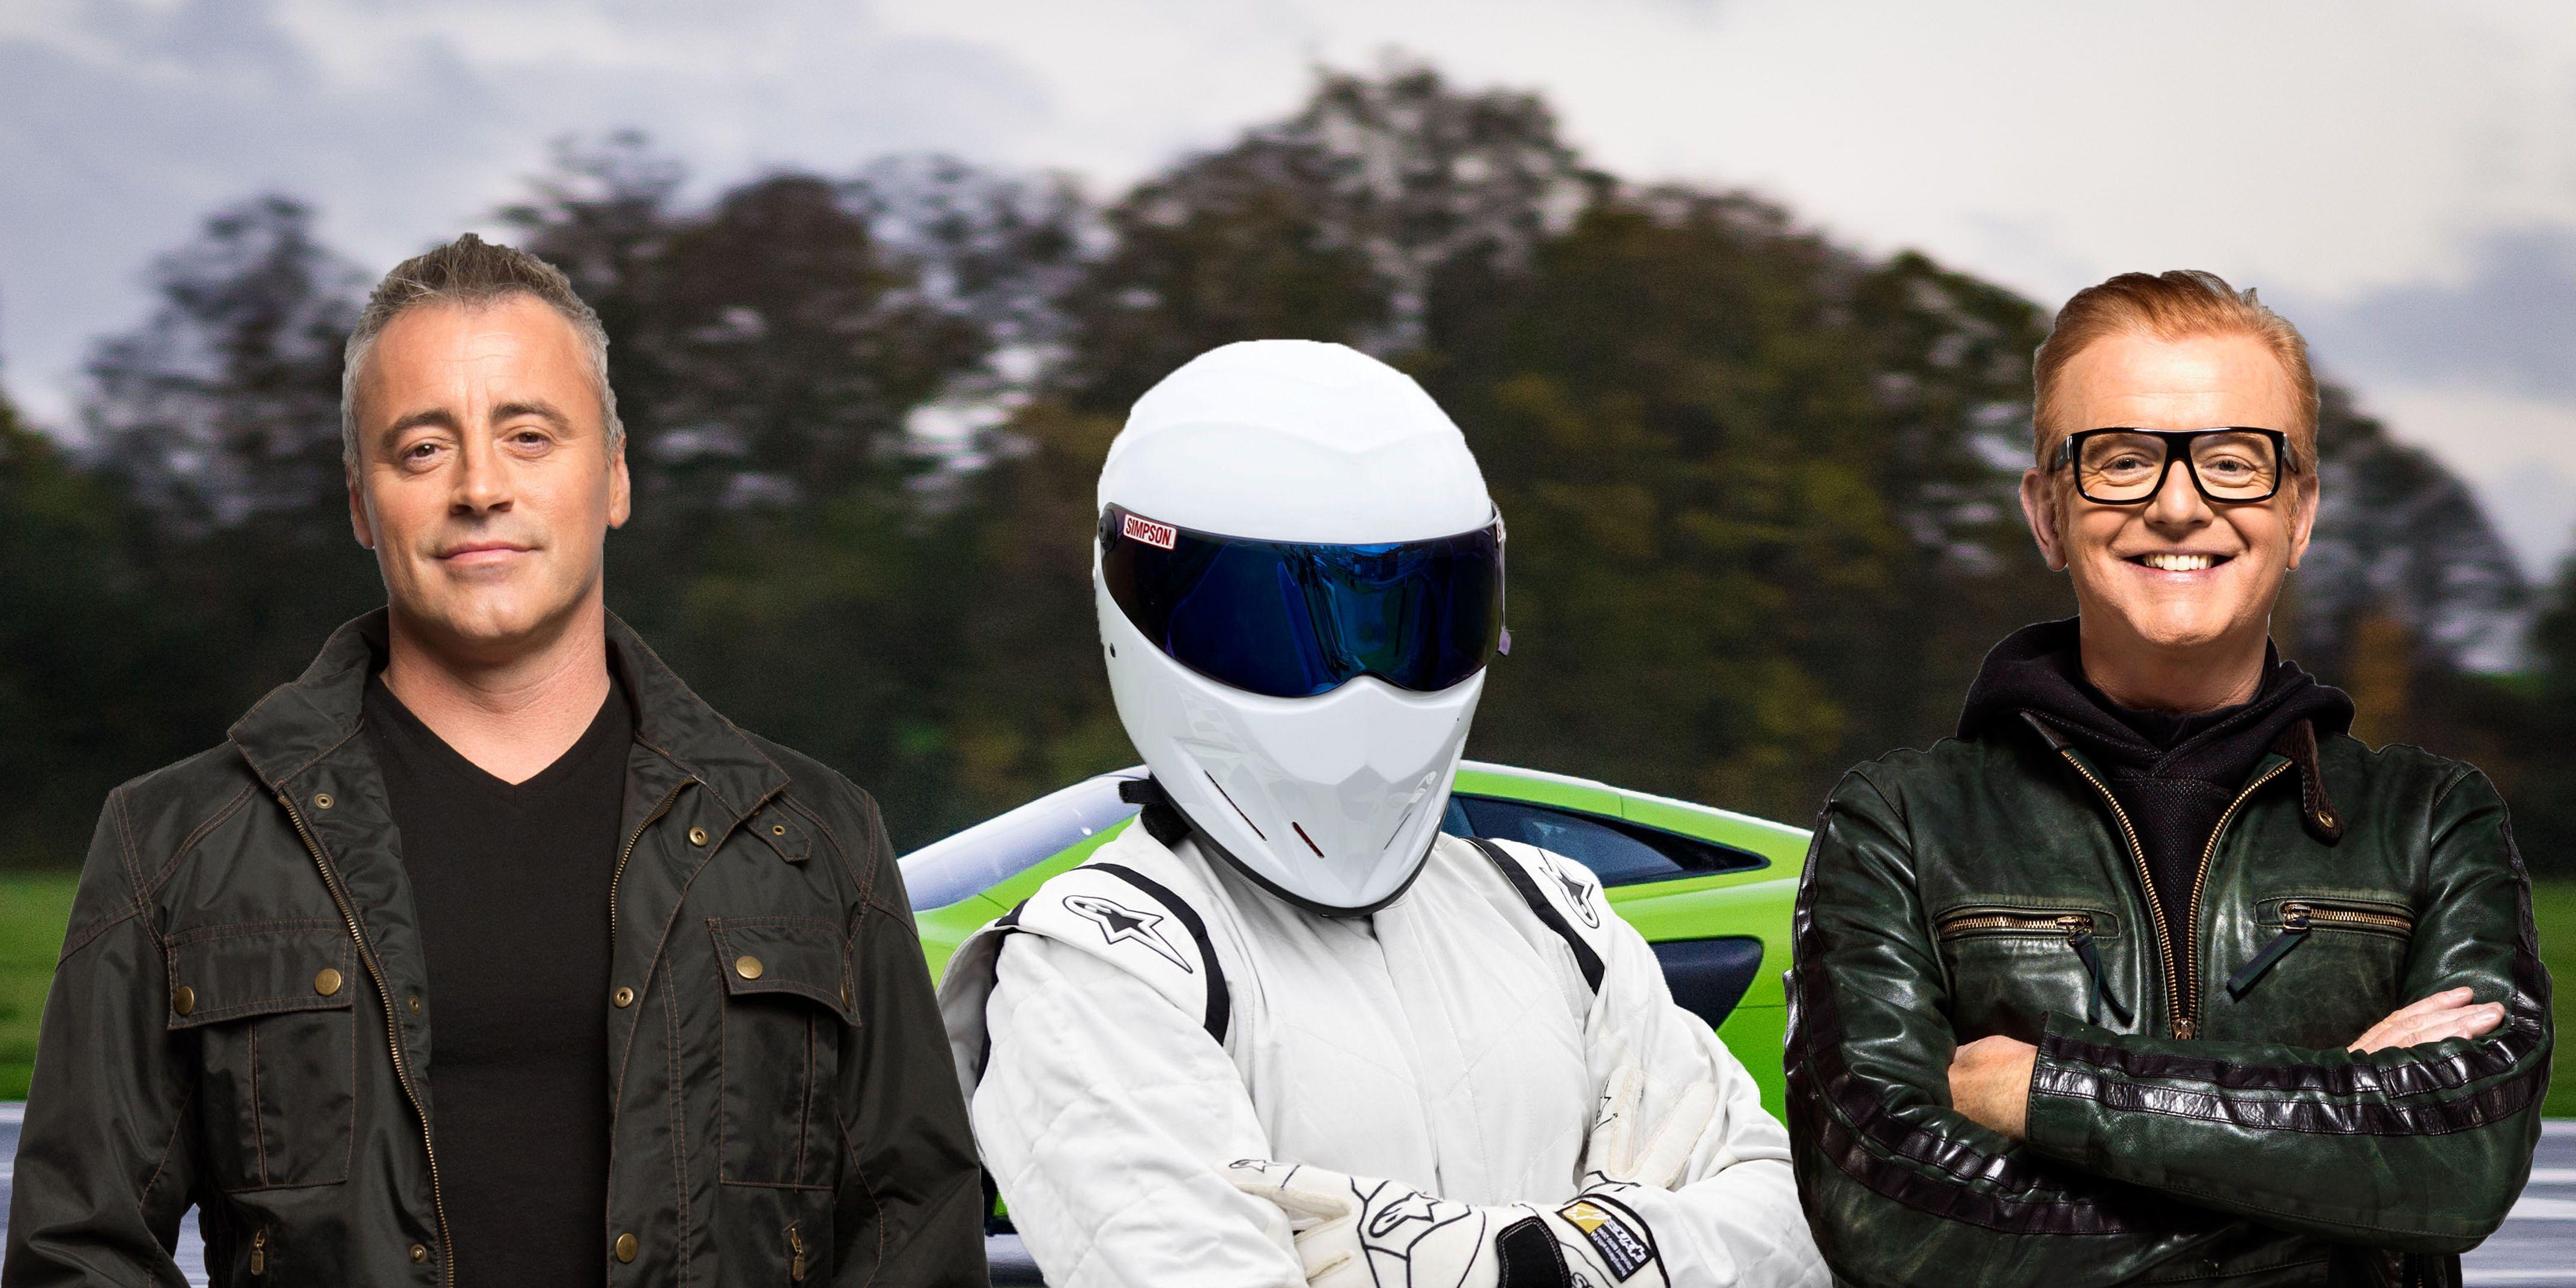 PHOTOSHOP Top Gear presenters, Matt LeBlanc, The Stig, Chris Evans